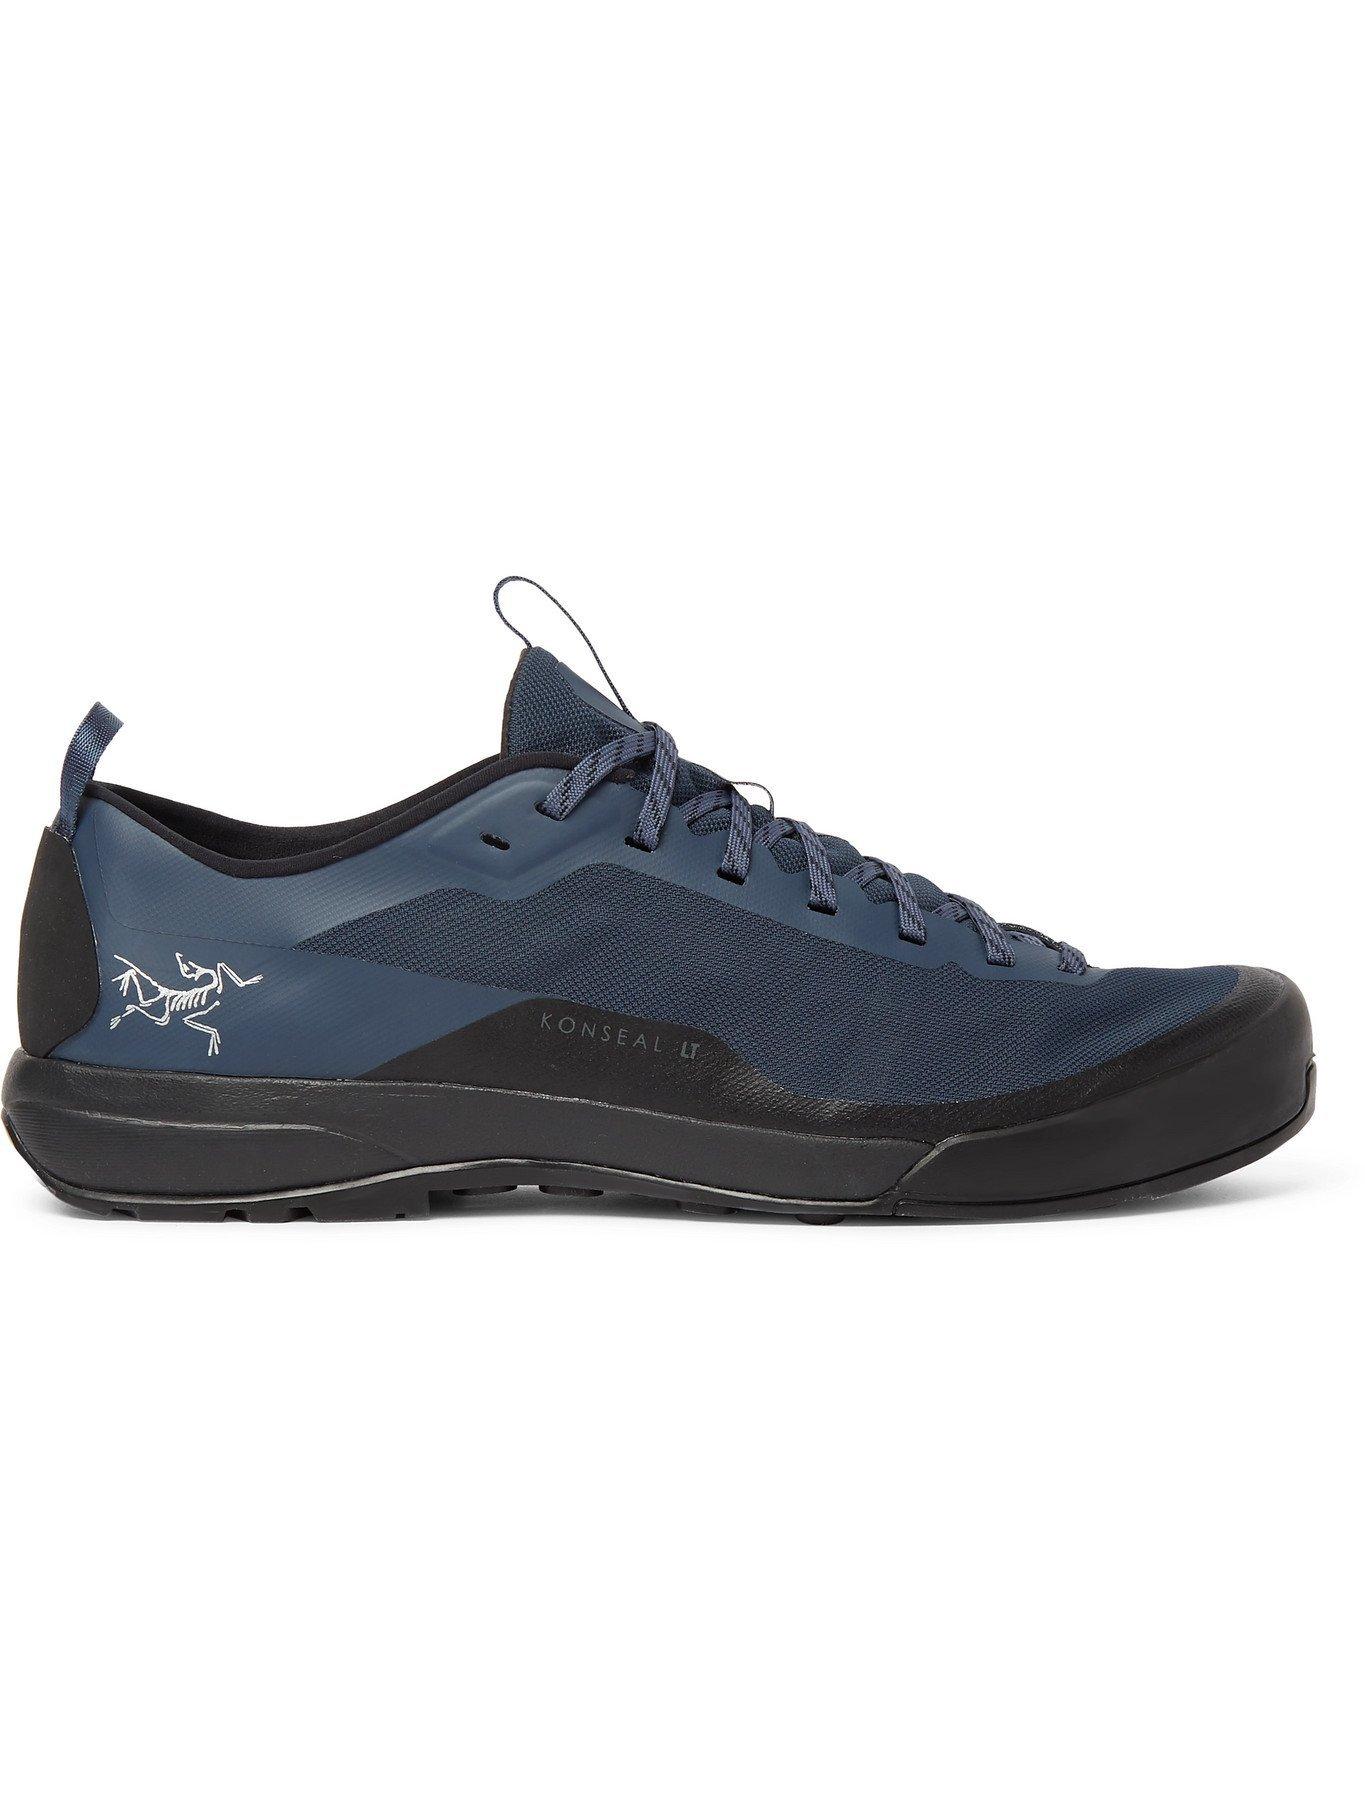 Photo: ARC'TERYX - Konseal LT Rubber-Timmed Mesh Hiking Sneakers - Blue